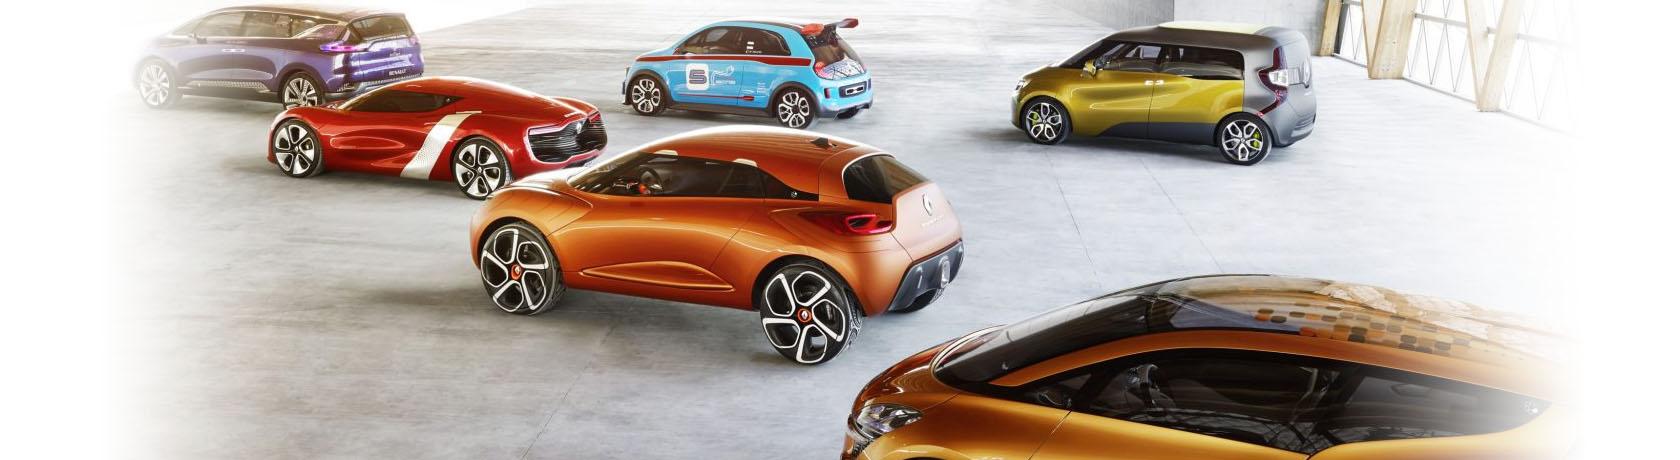 About DC Motors Renault Rockhampton